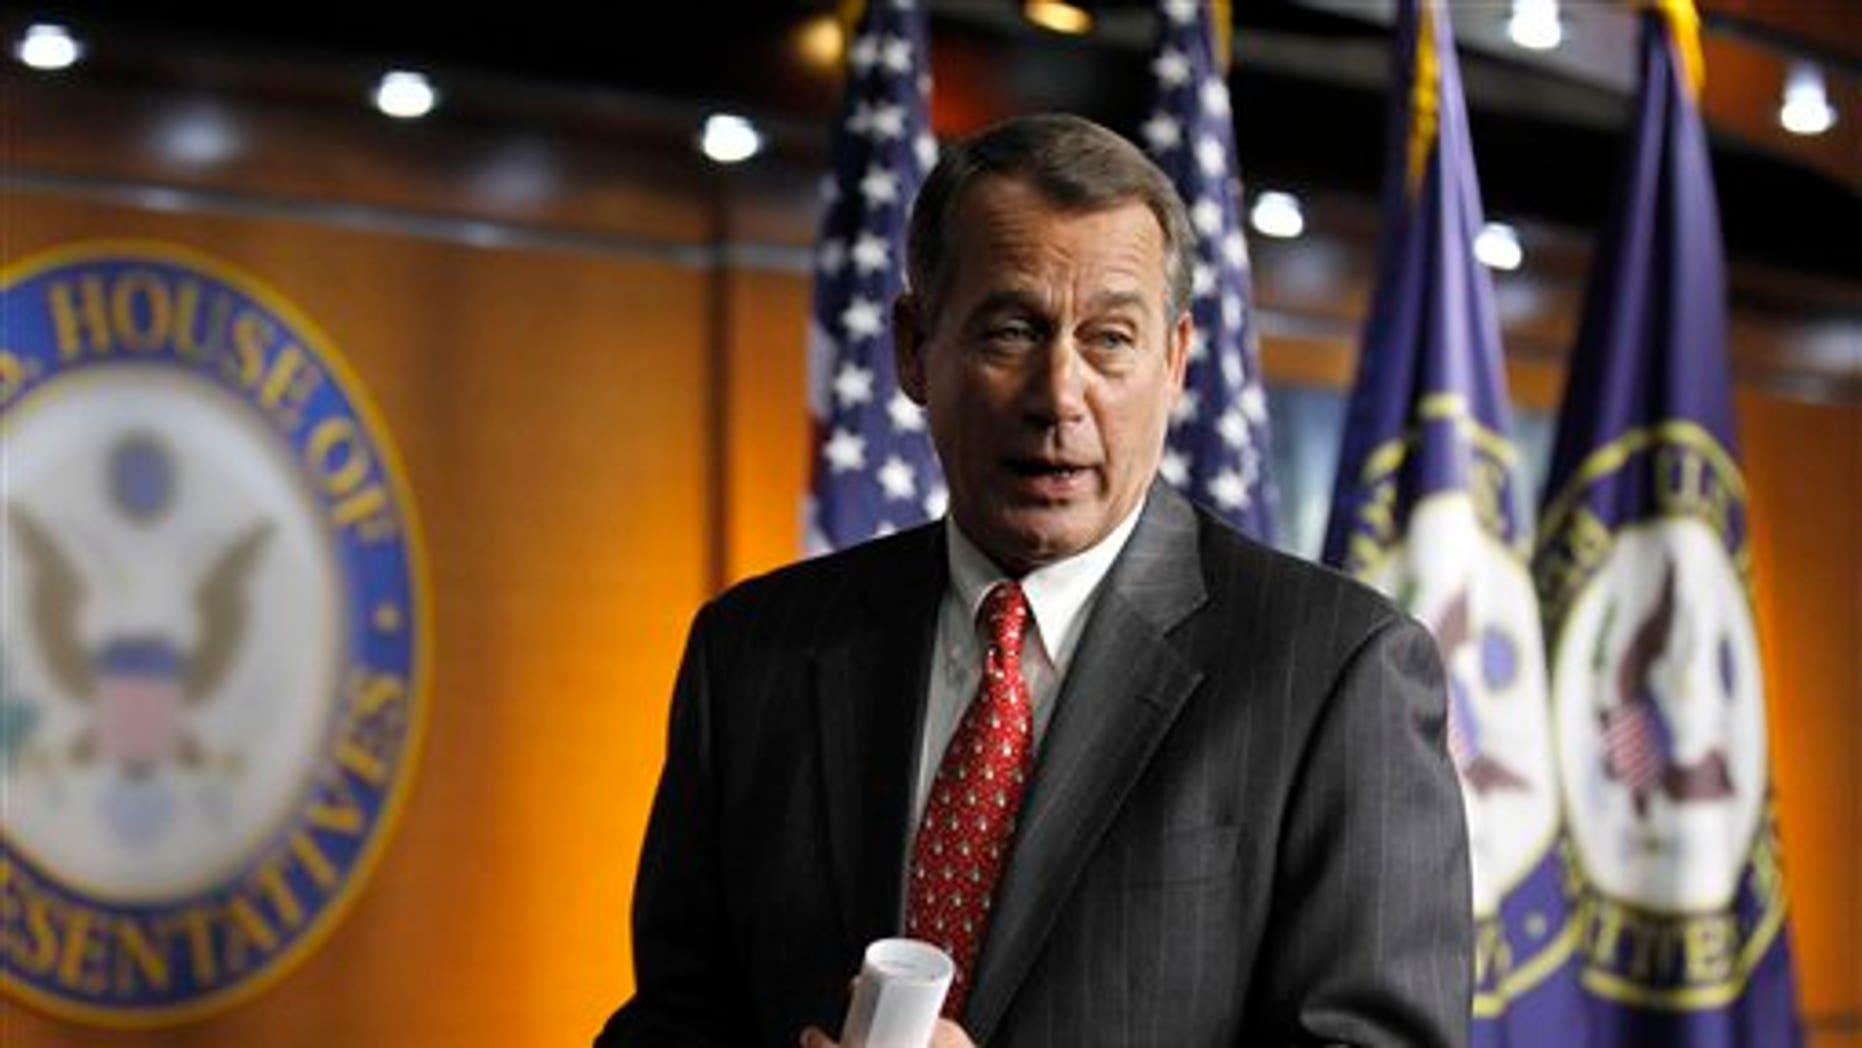 In this Dec. 17 photo, House Speaker-designate John Boehner talks with media on Capitol Hill in Washington.